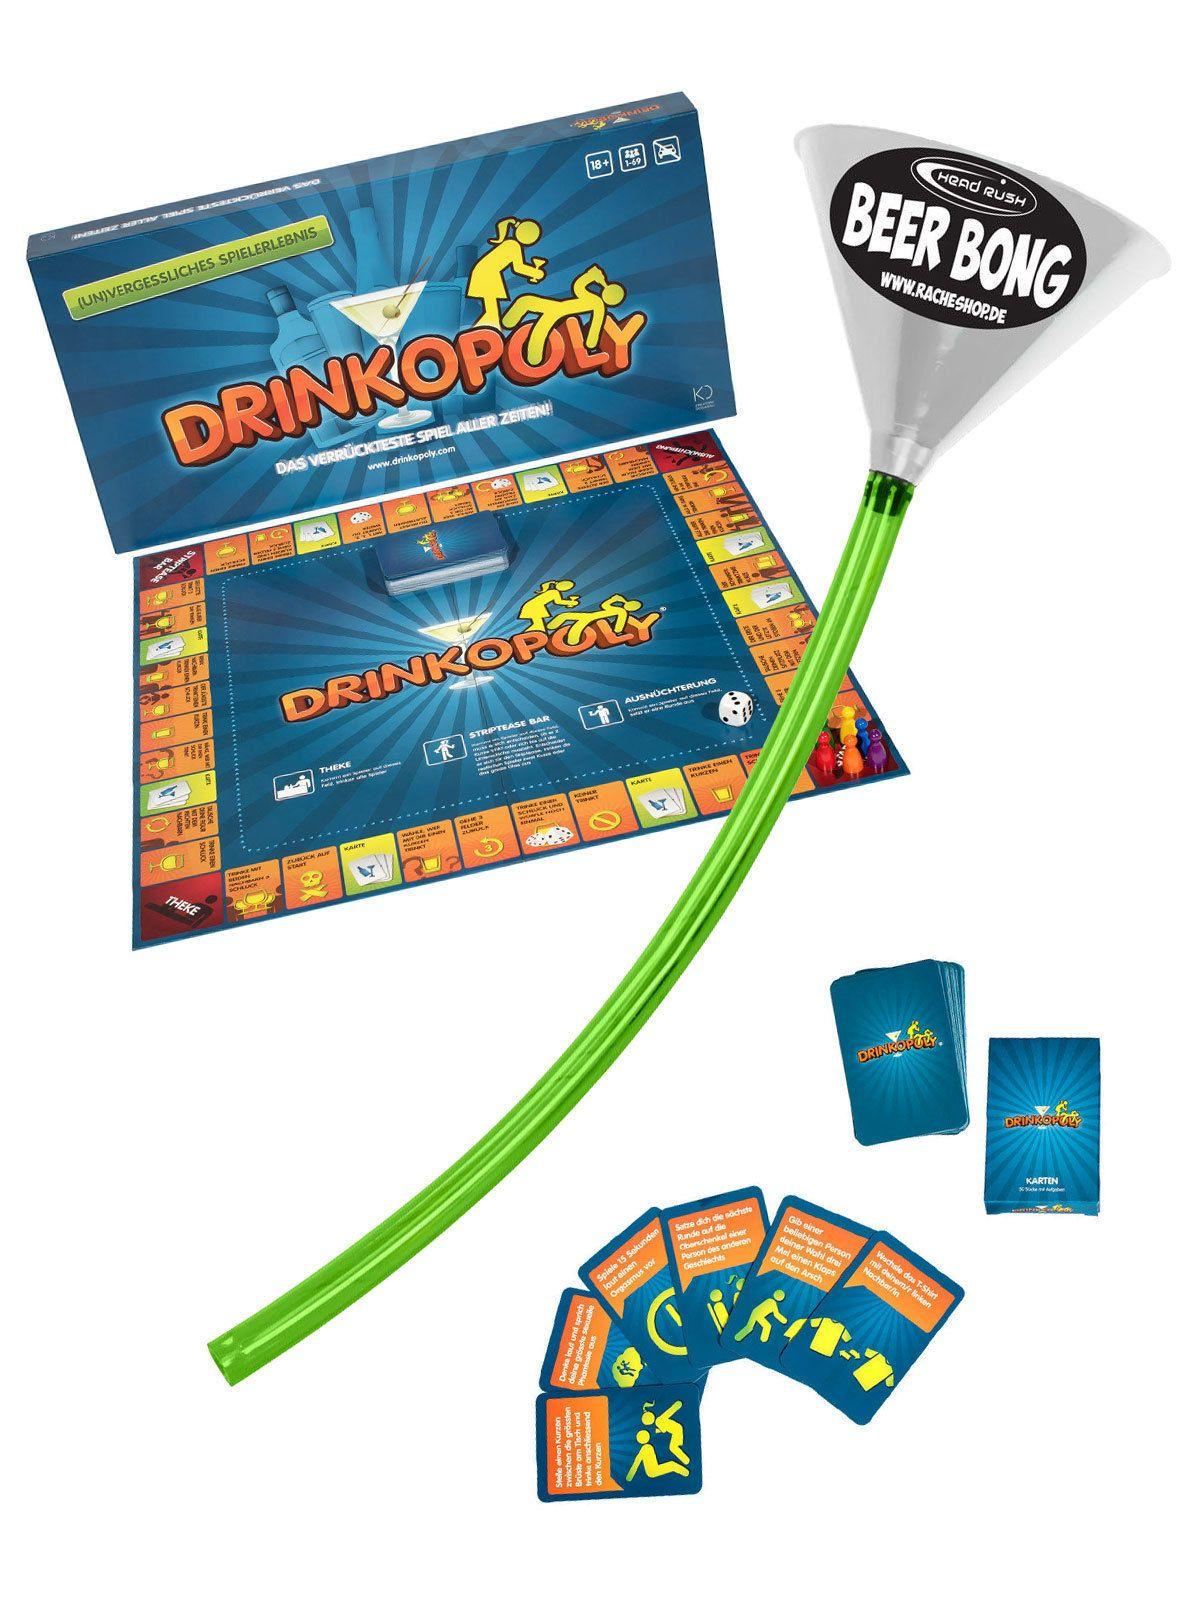 Drinkopoly Party Spiel Set Mit Ultimate Beer Bong  Teilig Bunt Aus Der